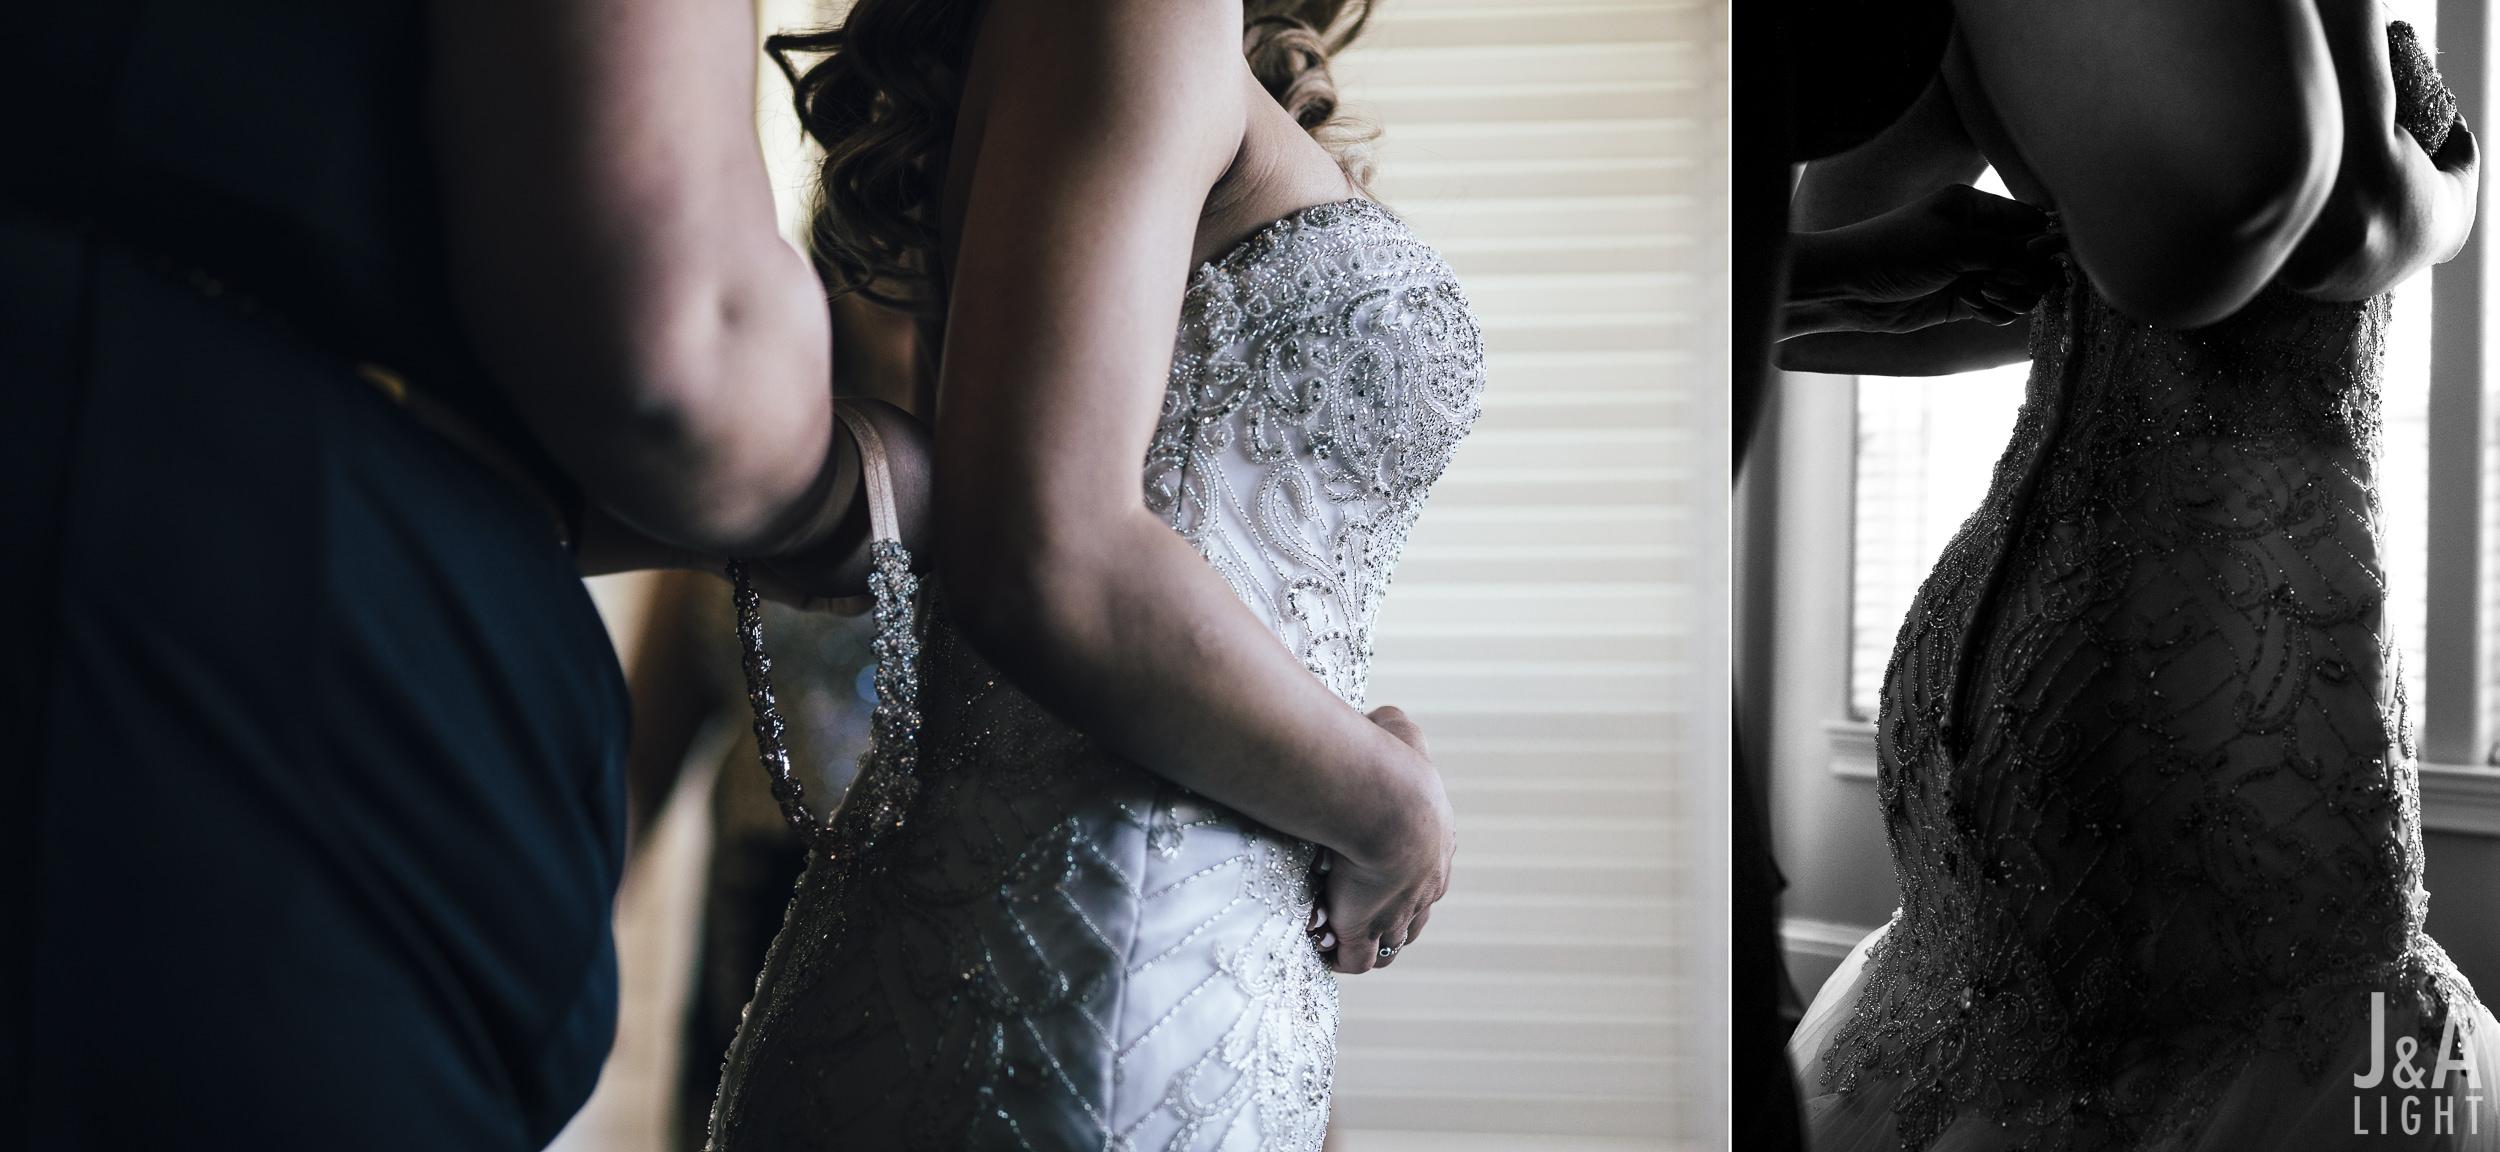 20171014-JanDan-LosBanos-GlassMansion-Wedding-Blog-013.jpg